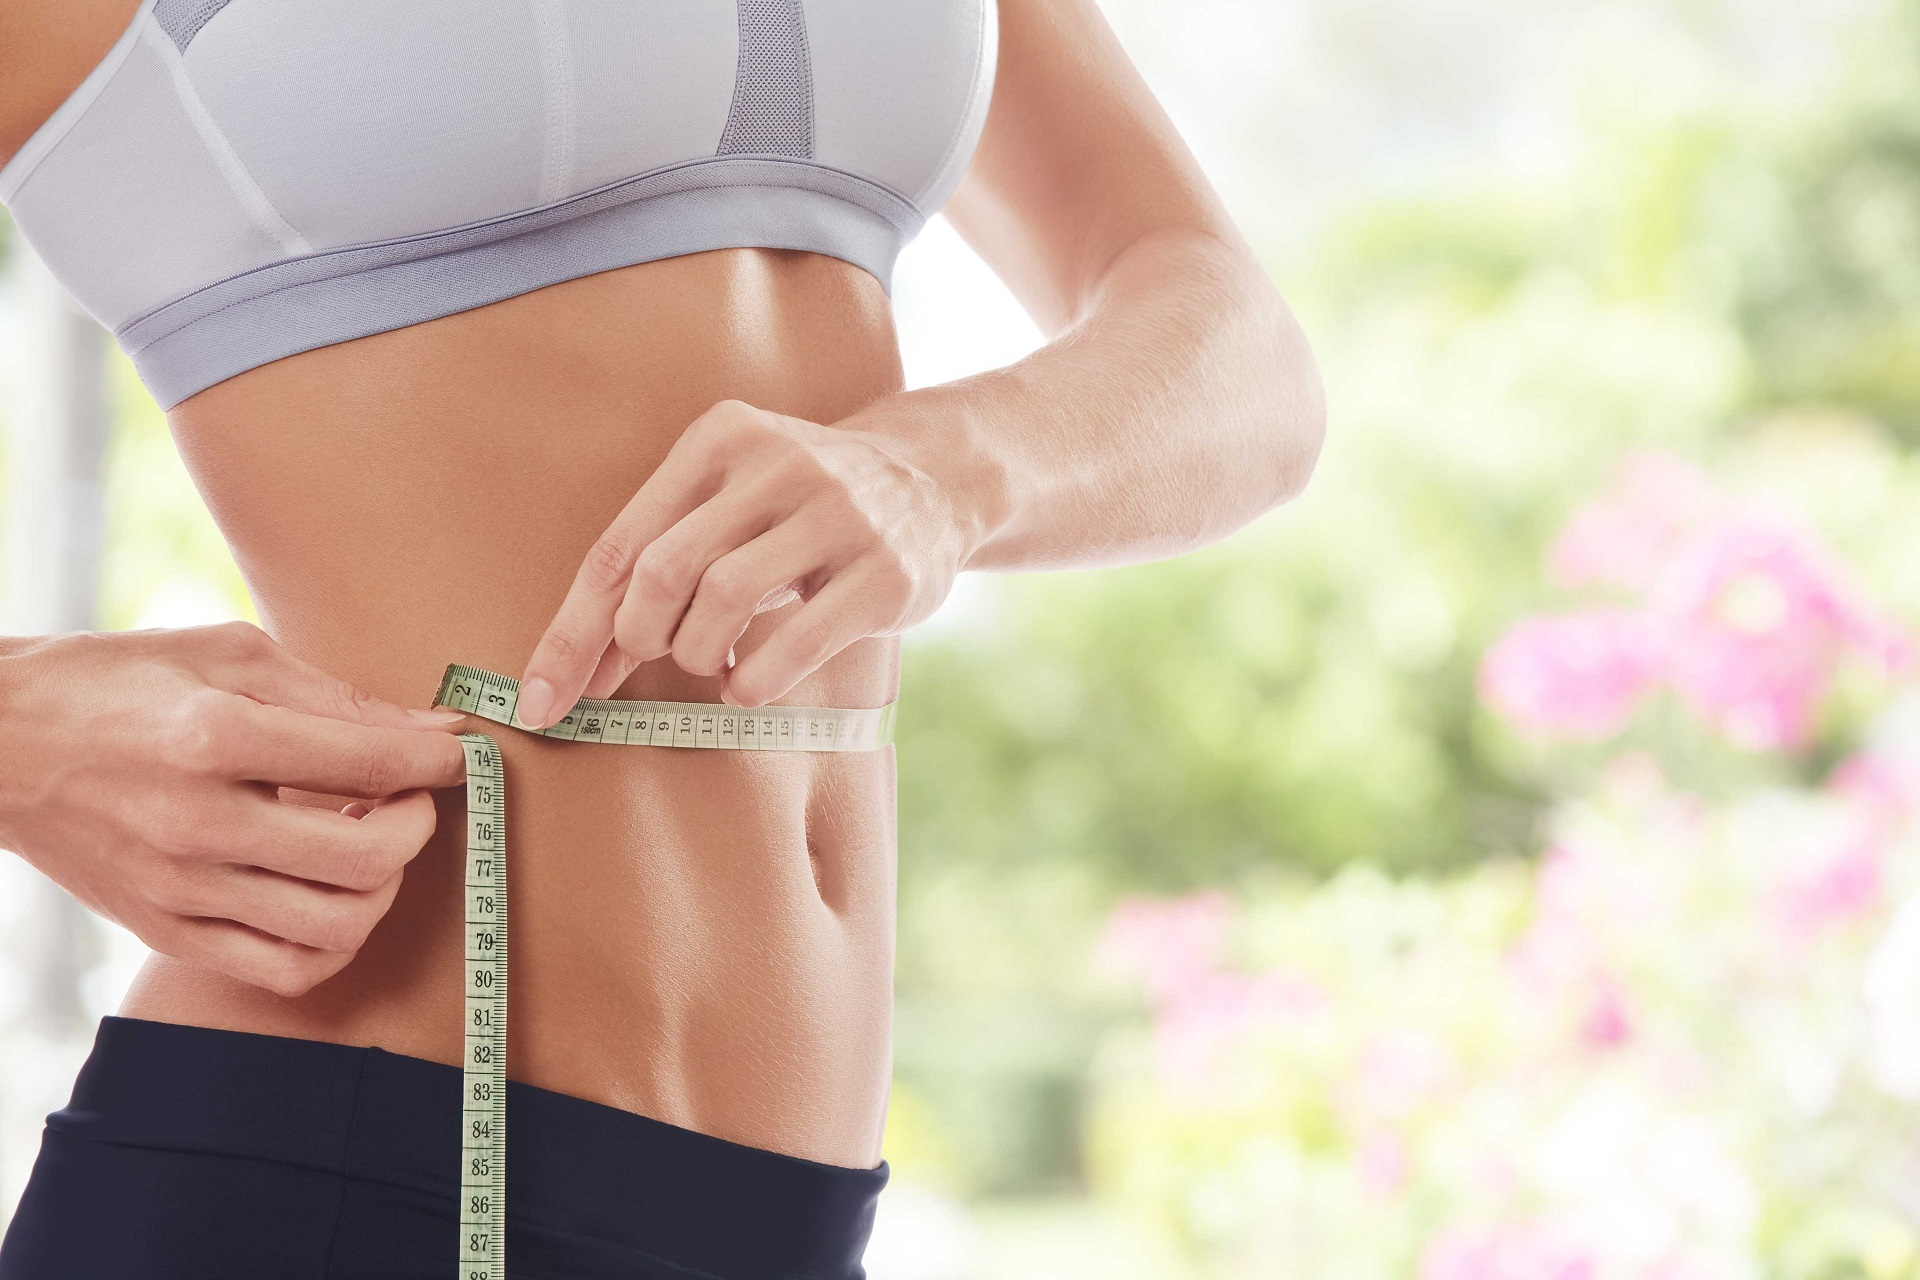 10 Fastest Ways to Lose Weight